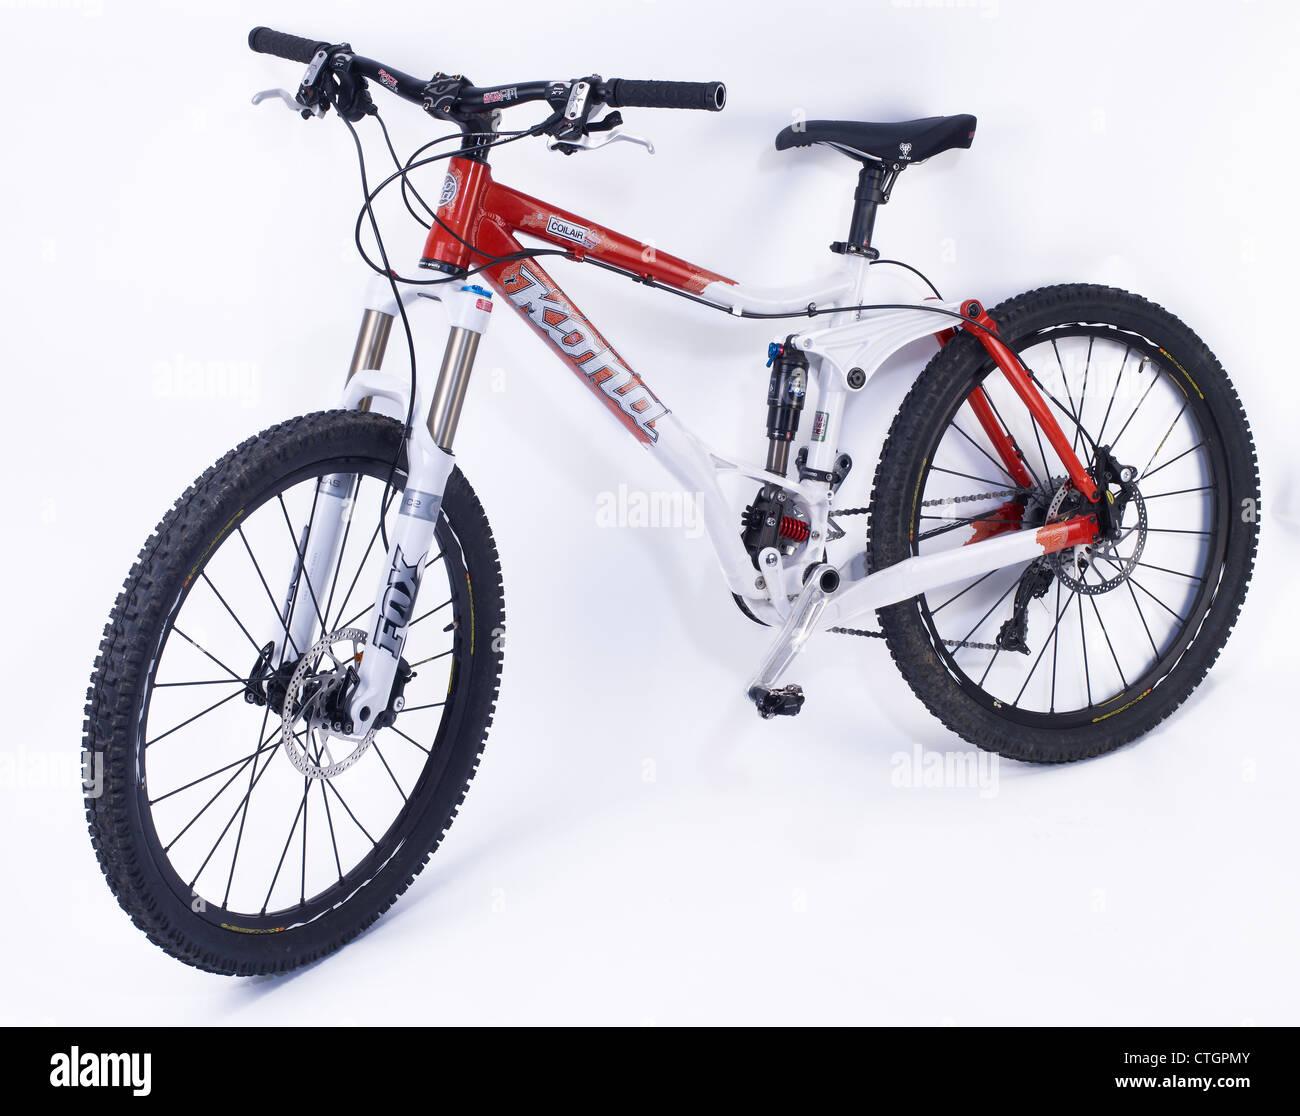 Kona dual suspension mountain bike - Stock Image